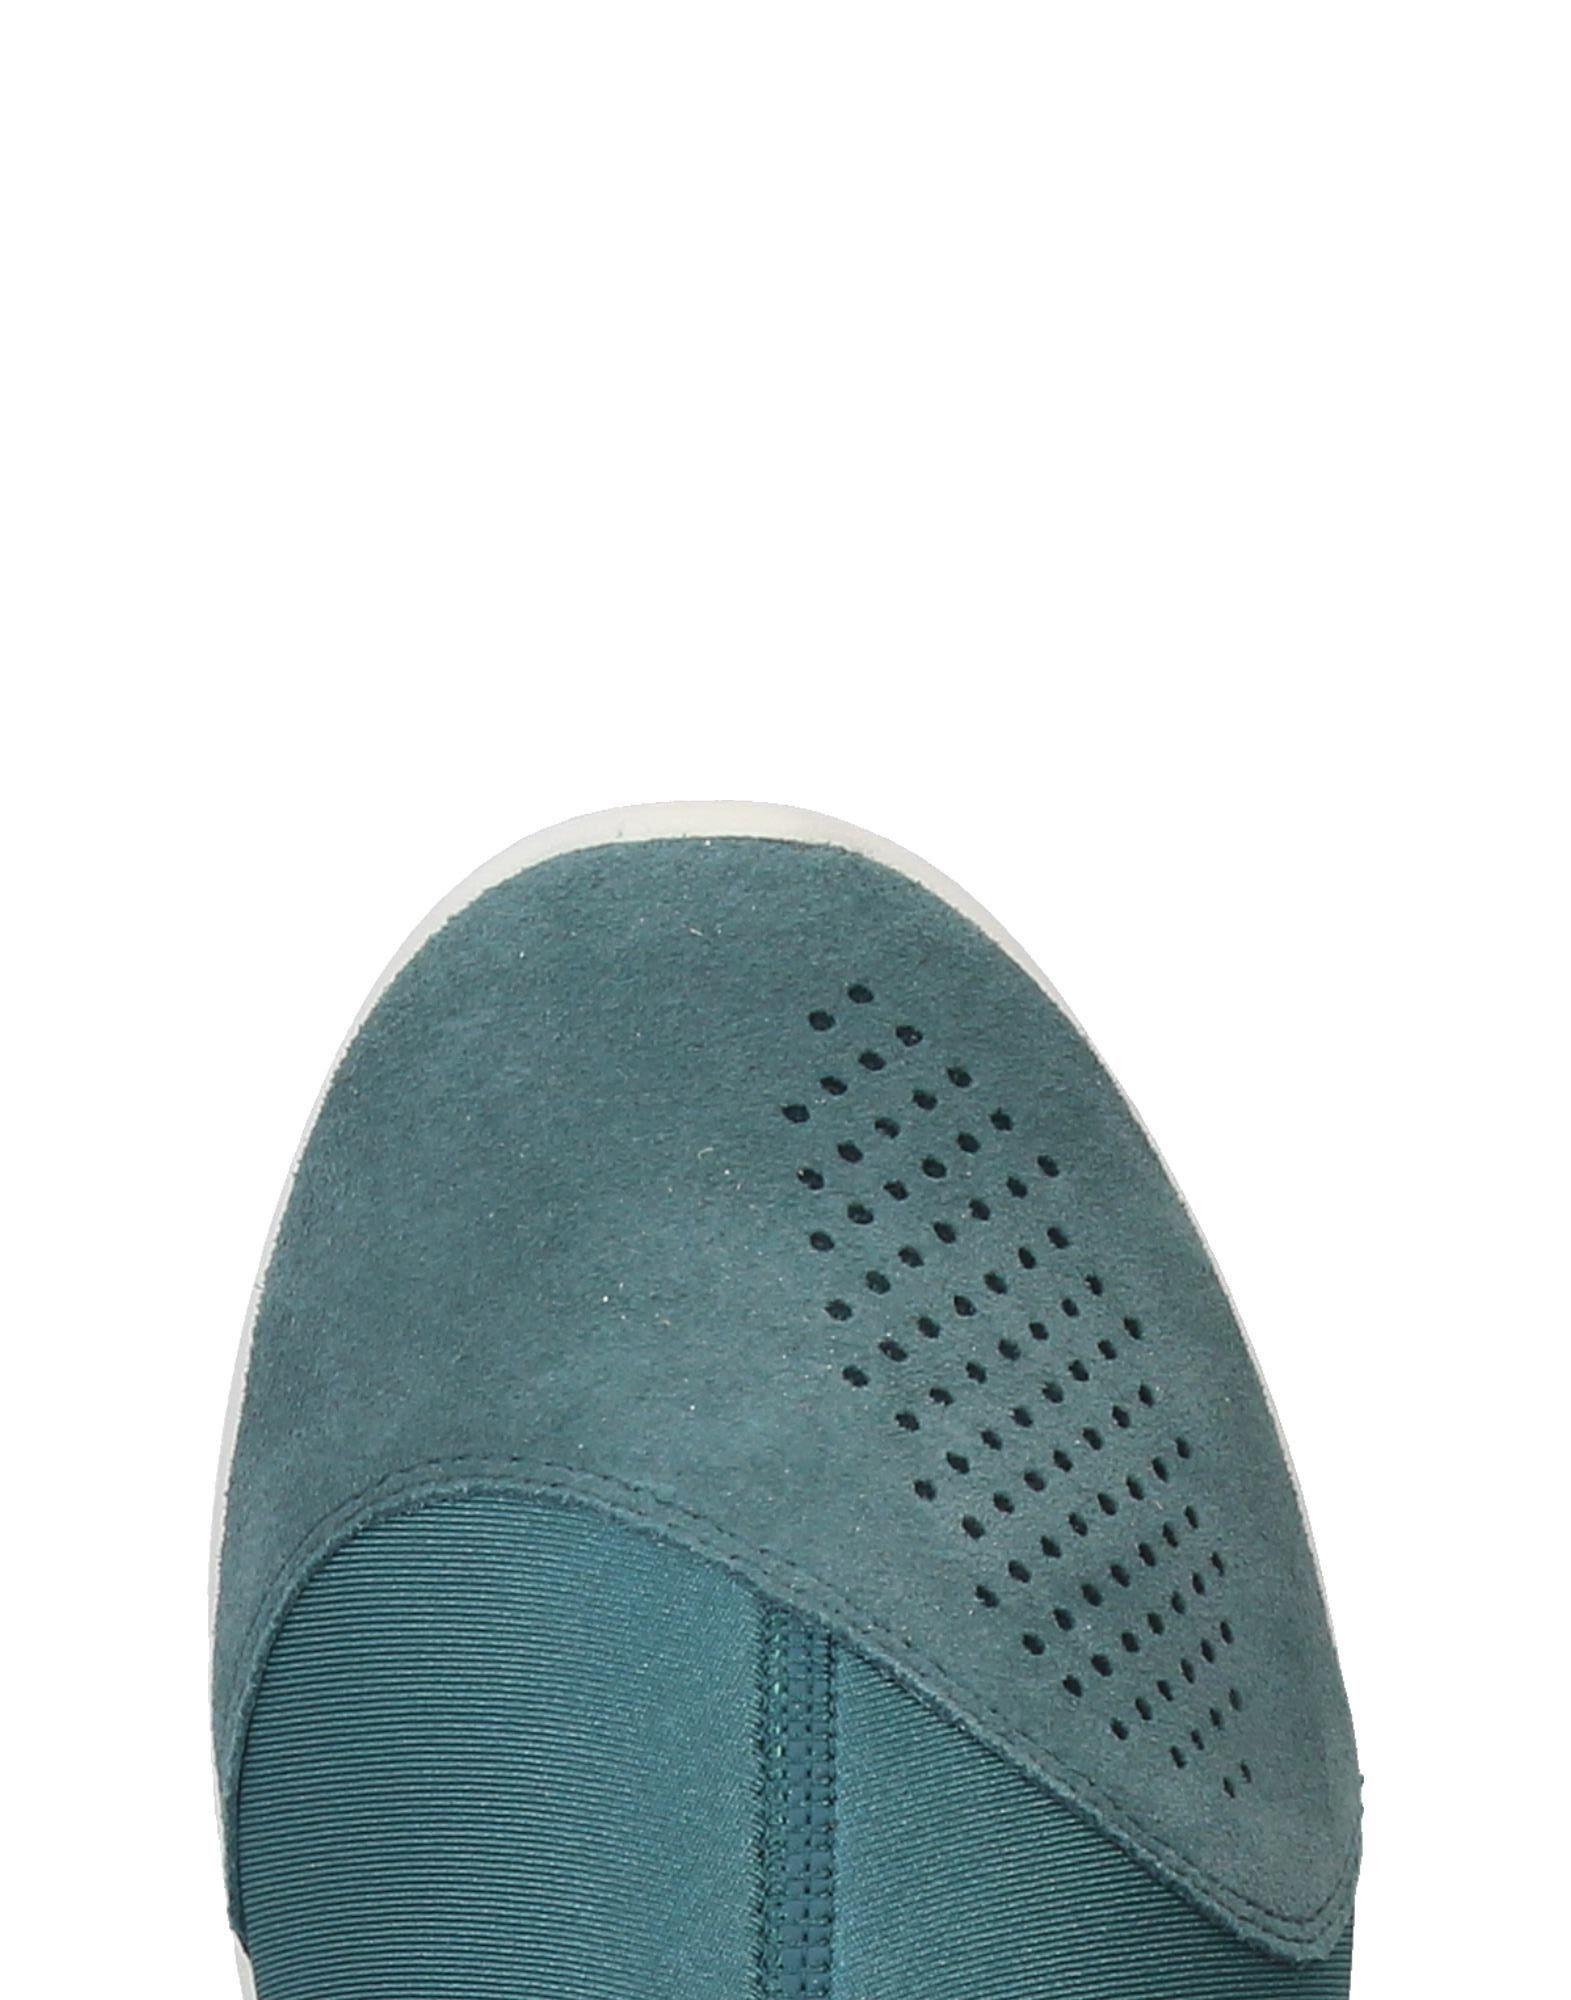 Rabatt echte Schuhe Herren Nike Sneakers Herren Schuhe  11408541FX 2d9aa9